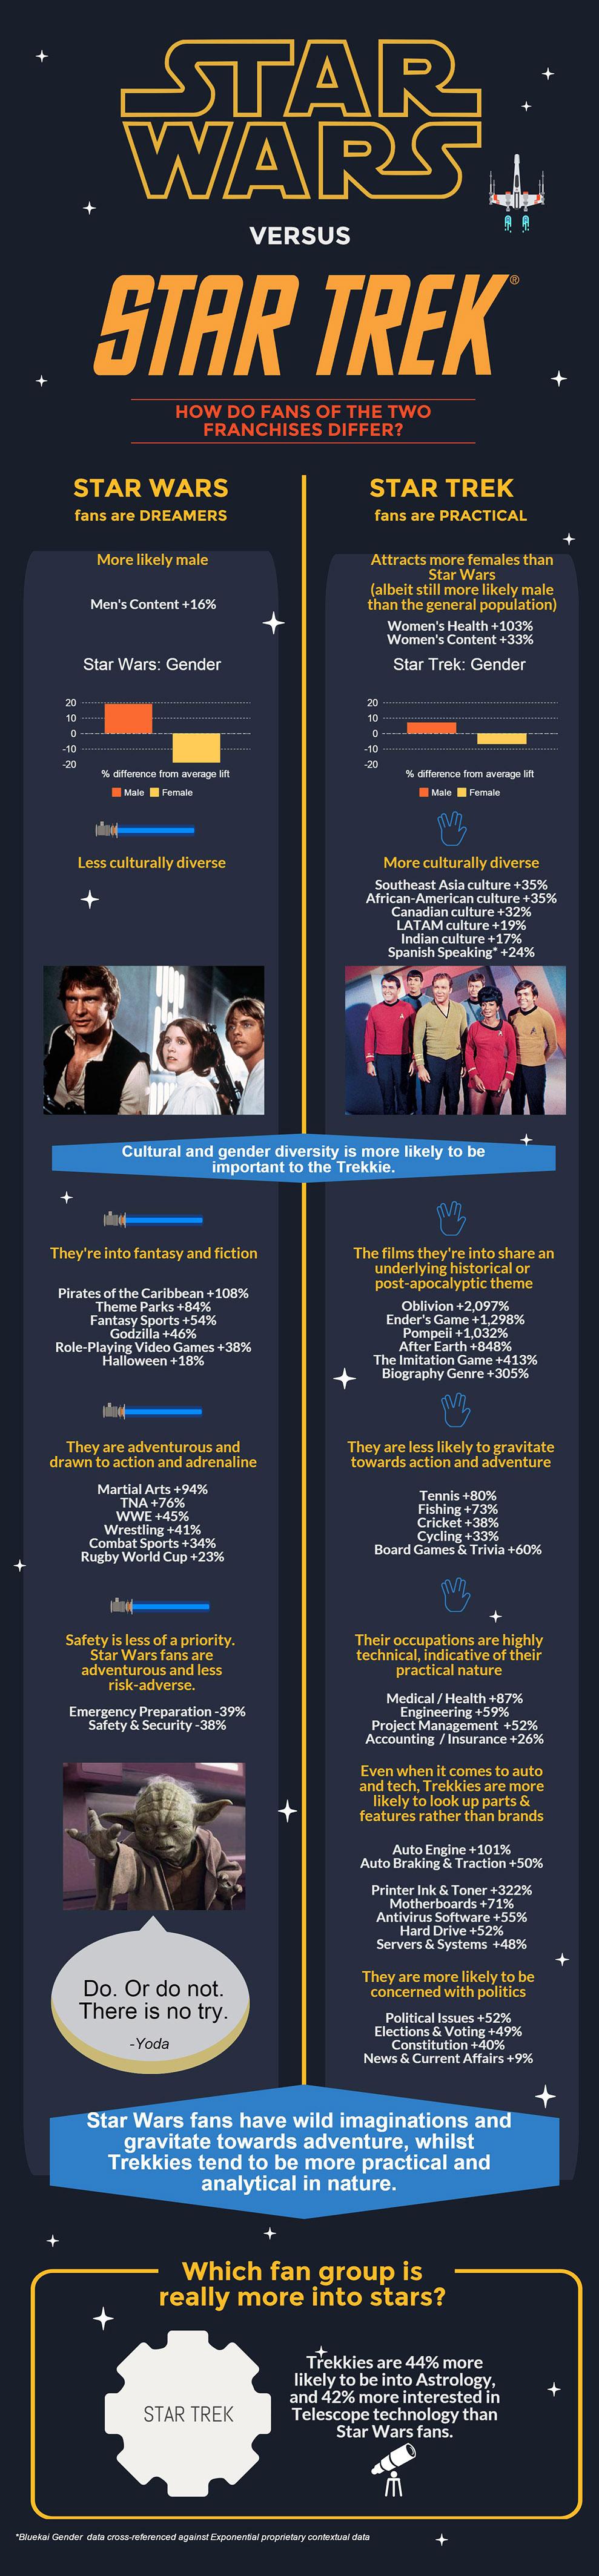 Star Wars Vs Star Trek